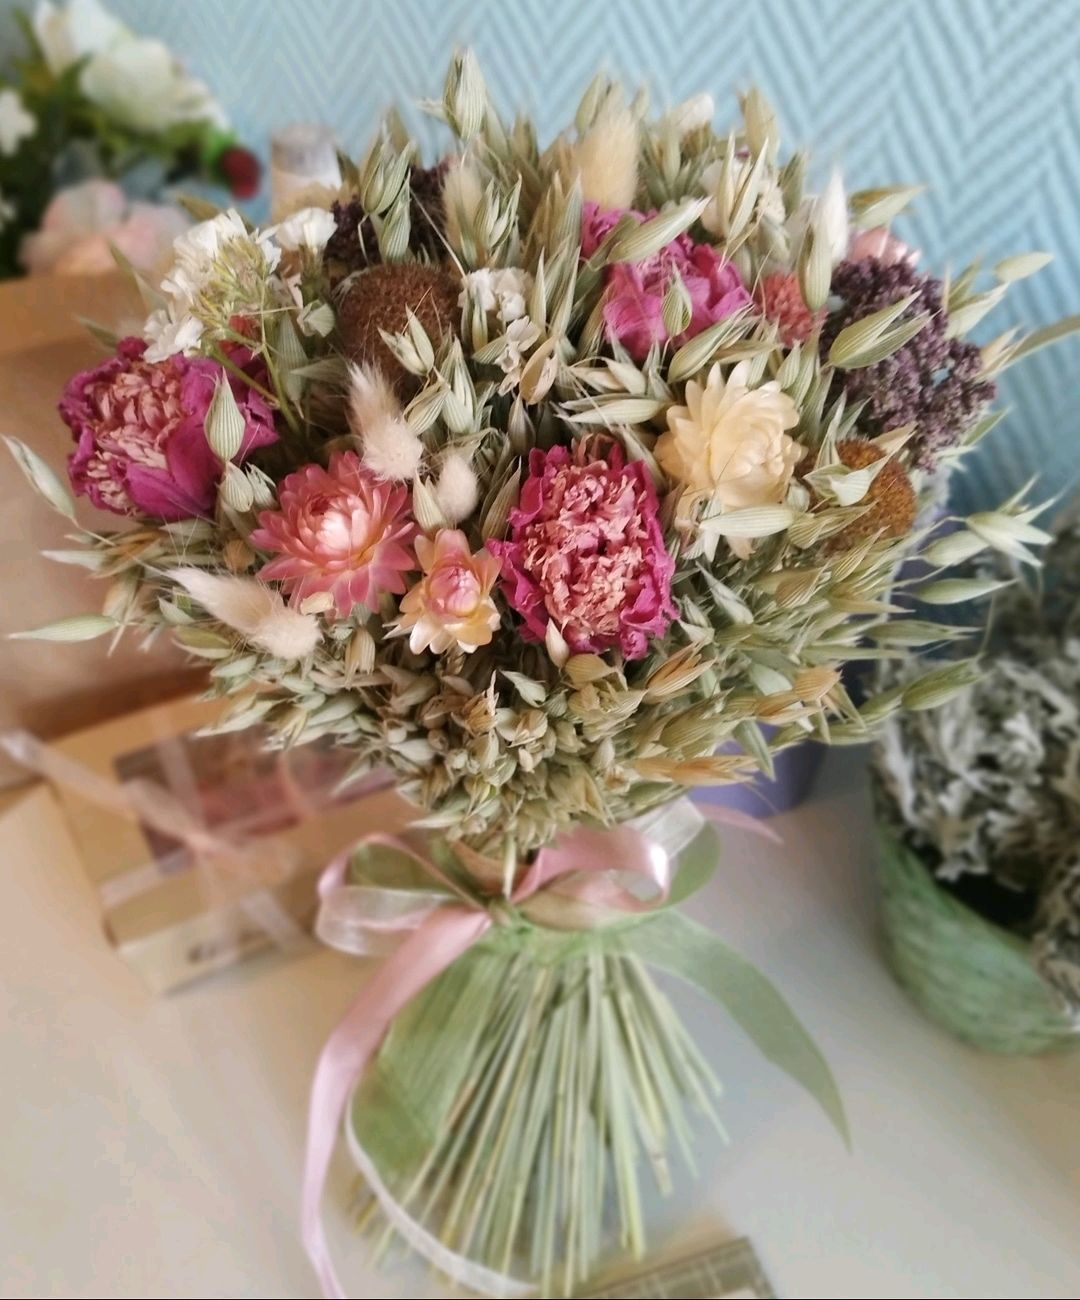 Букет из сухоцветов, Букеты, Самара,  Фото №1